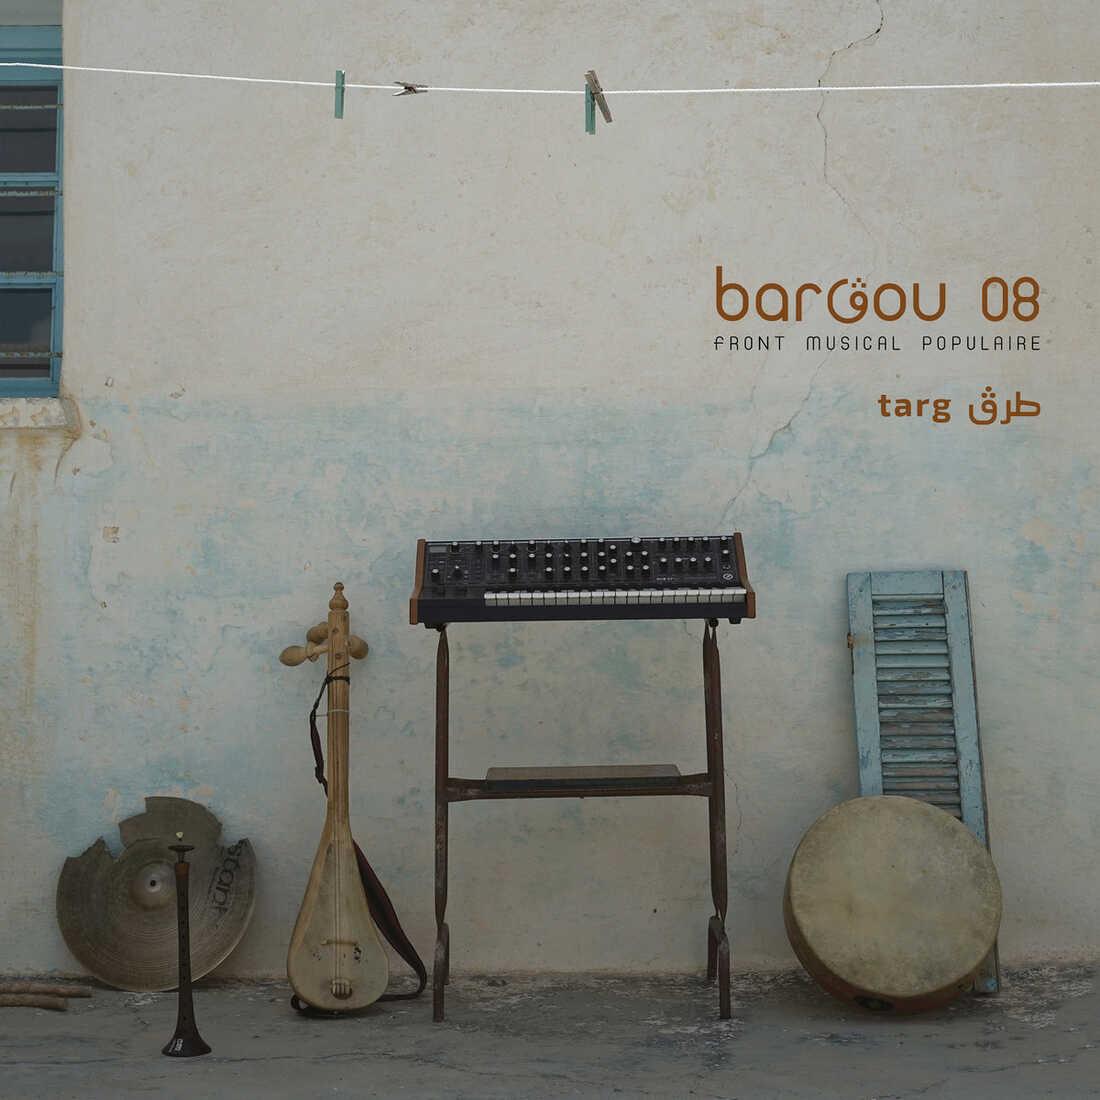 Bargou 08, Targ